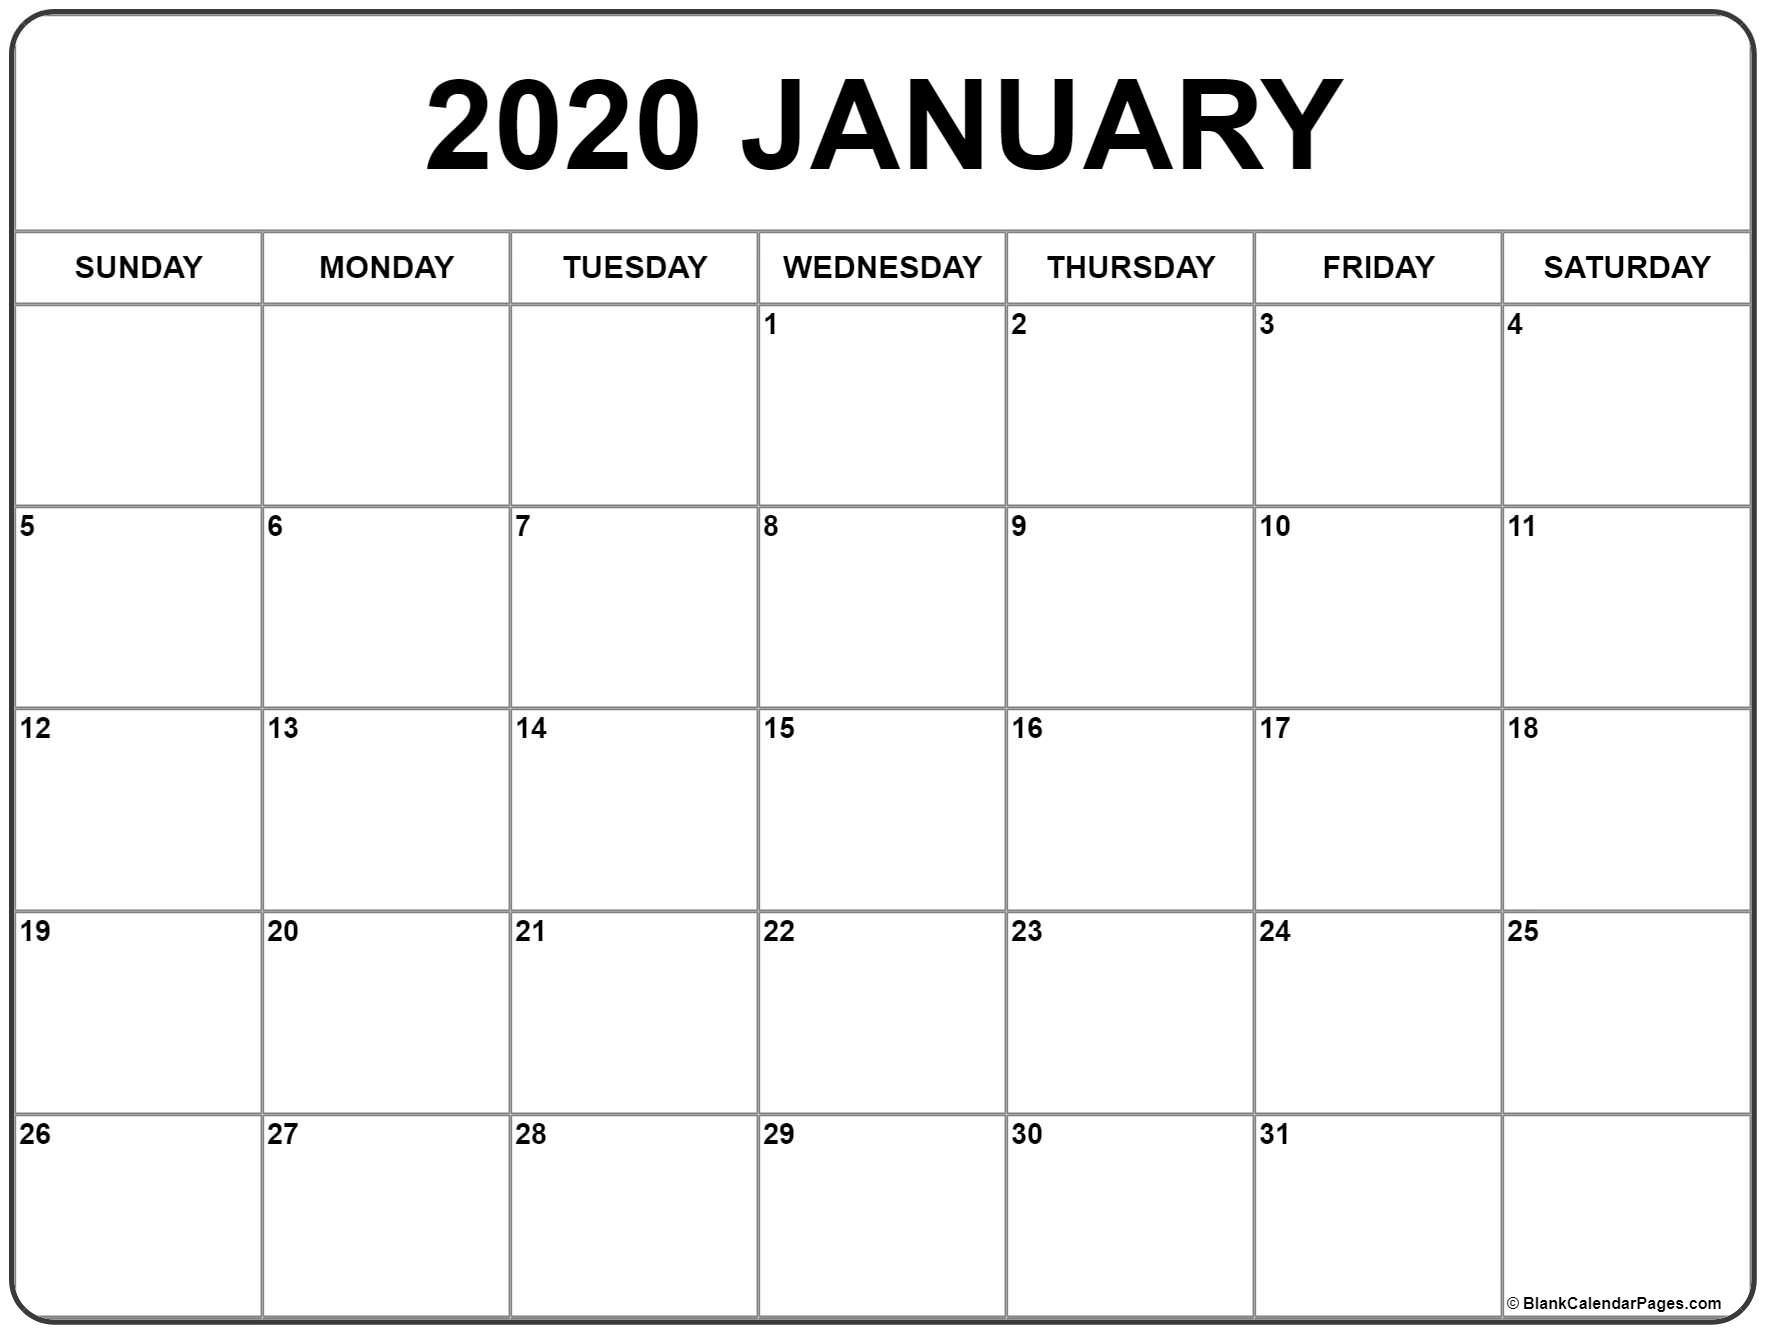 January 2020 Calendar | Free Printable Monthly Calendars regarding 2020 Calendar Printable Free Word Monthly